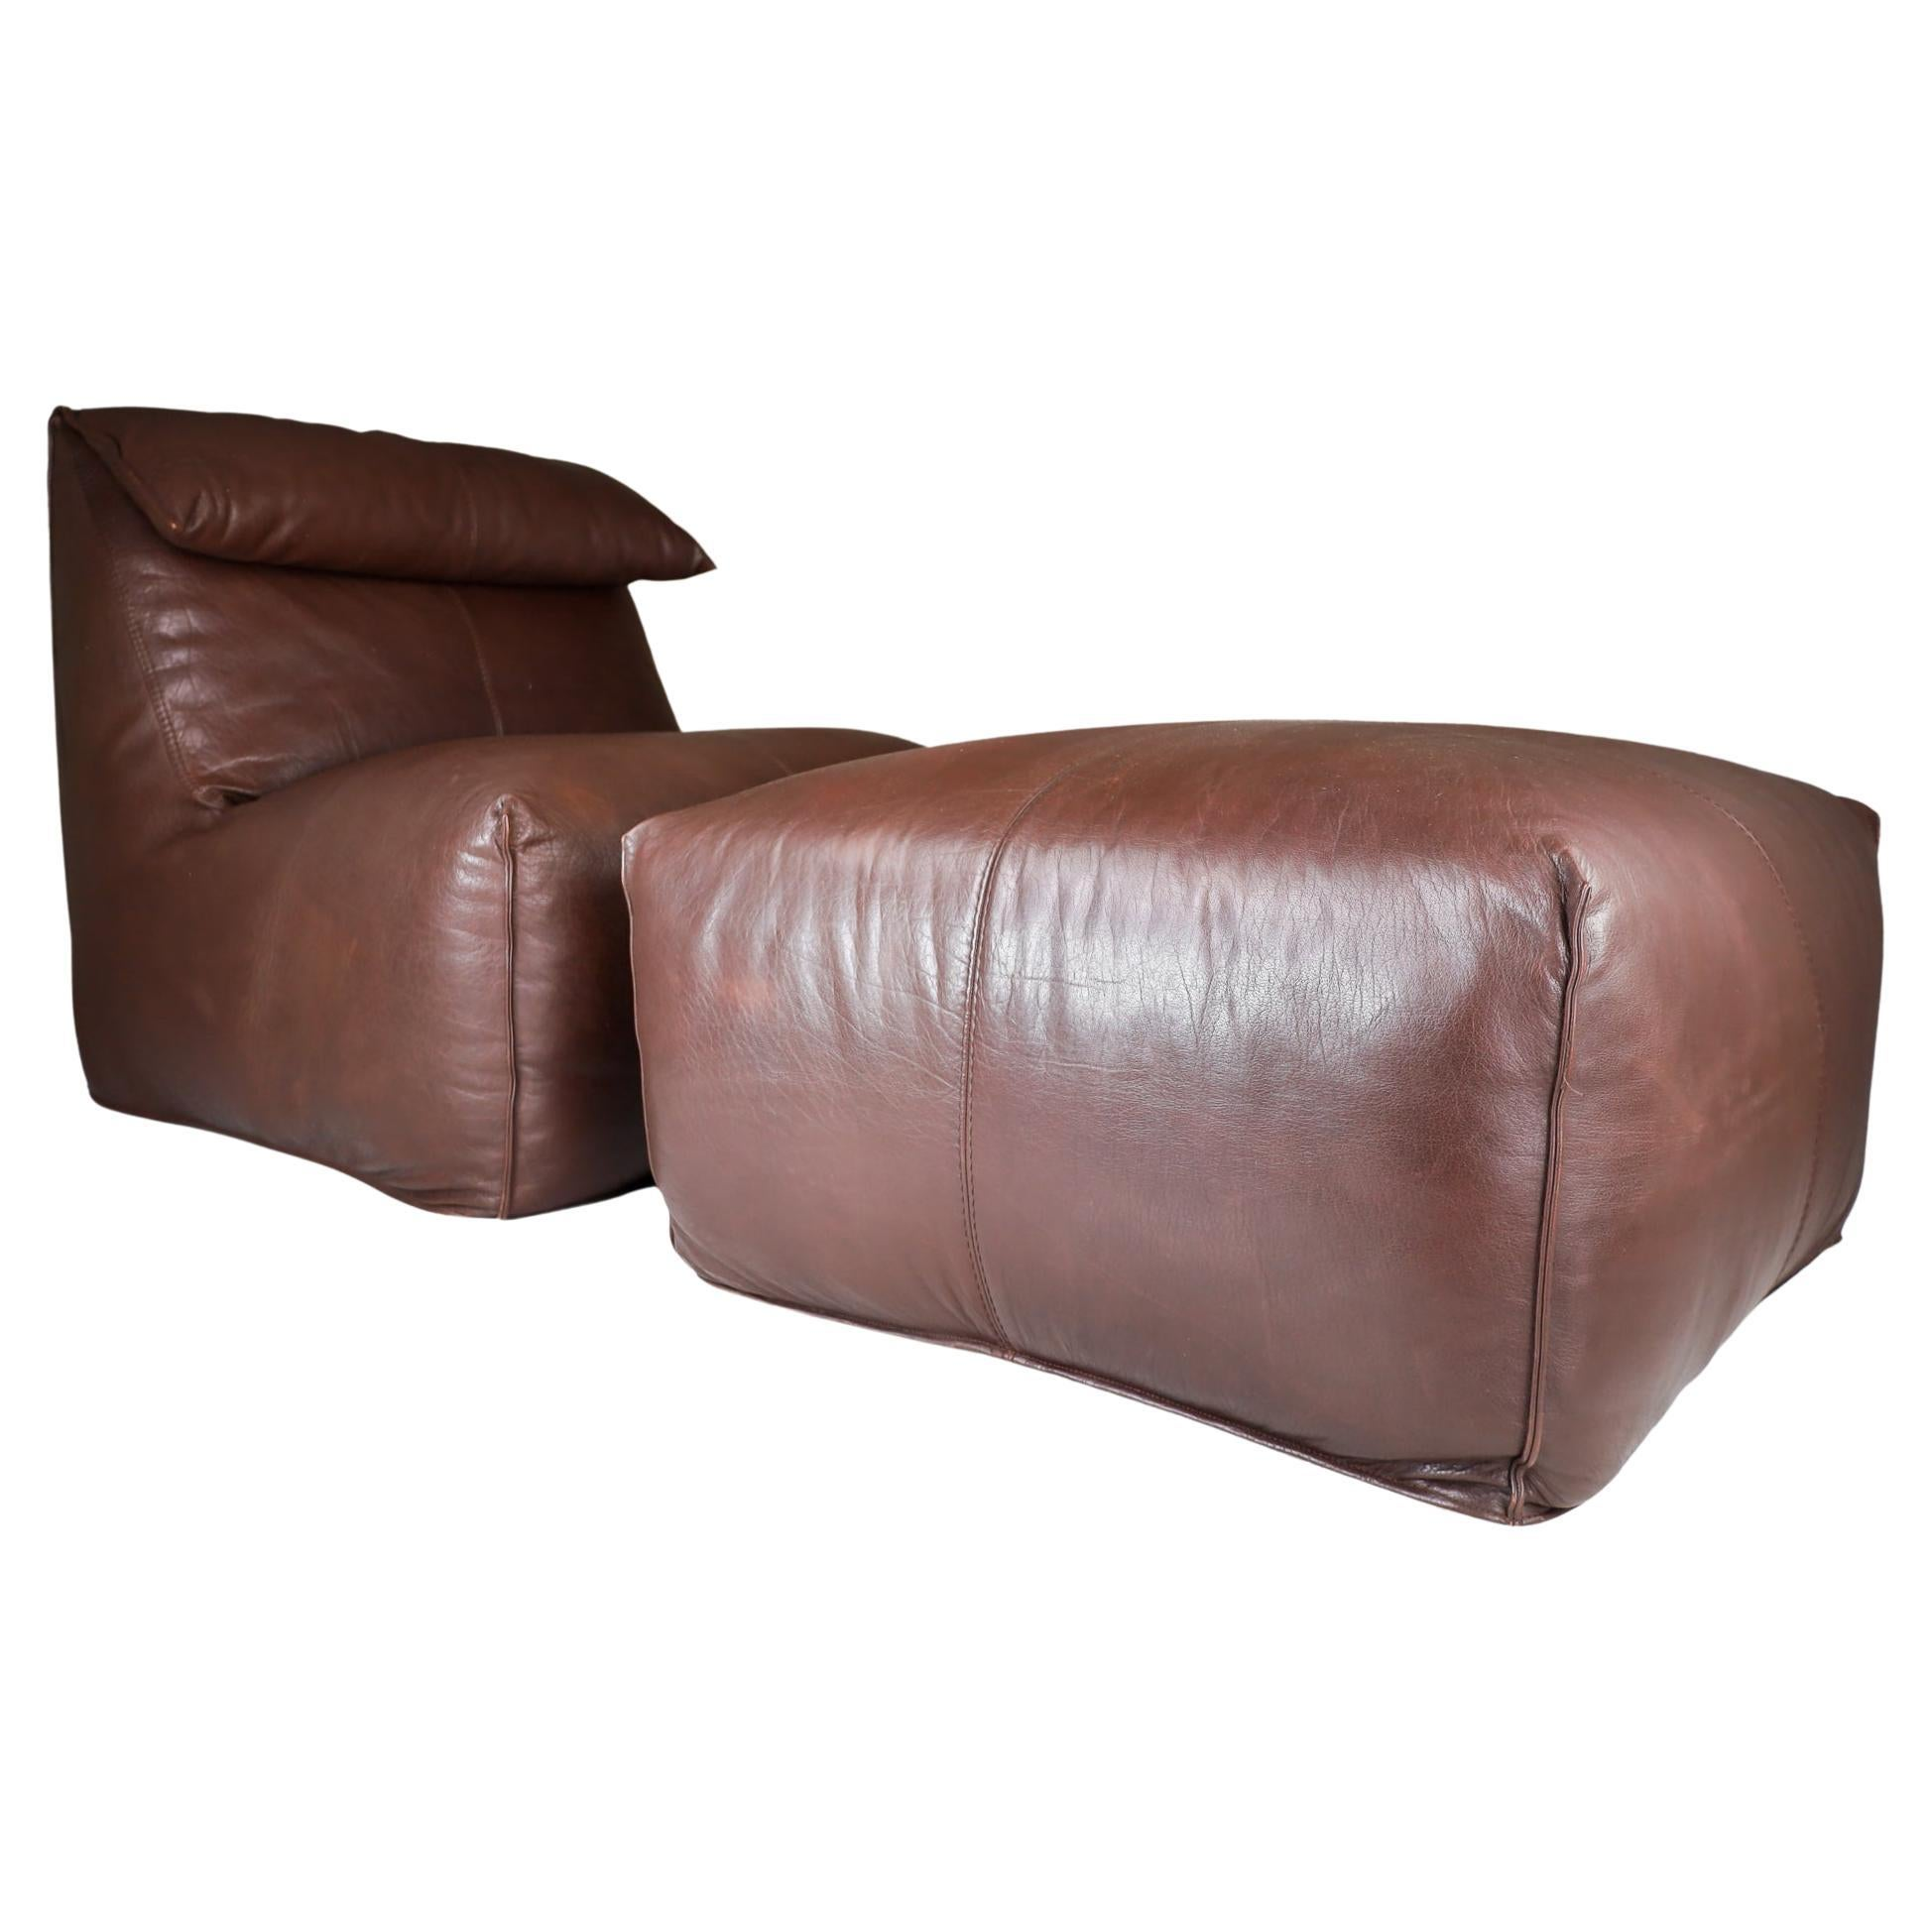 Original Leather Lounge Chair & Pouf Le Bambole by Mario Bellini for B&B Italia